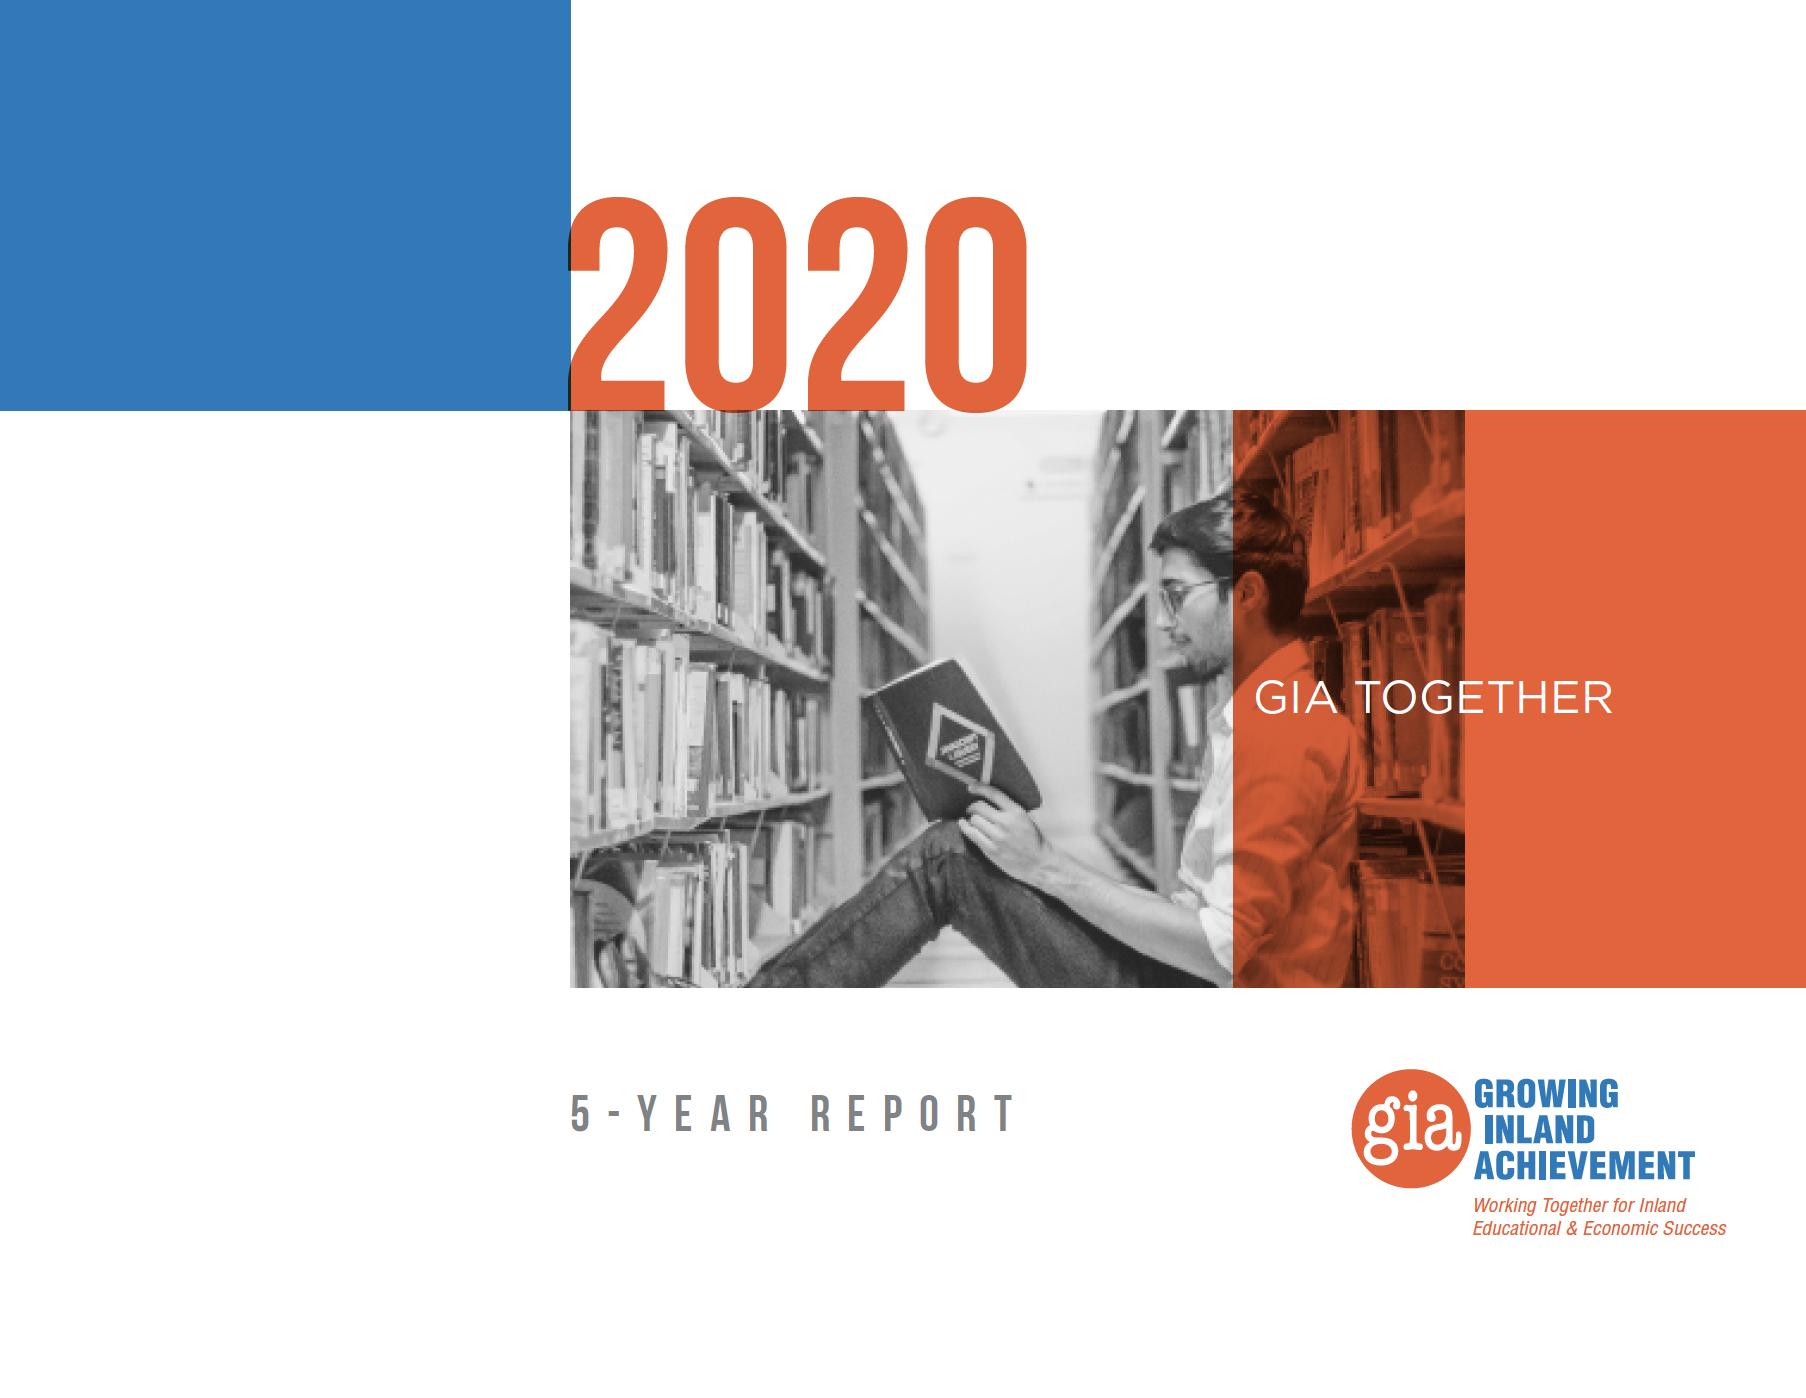 GIA 5 year report